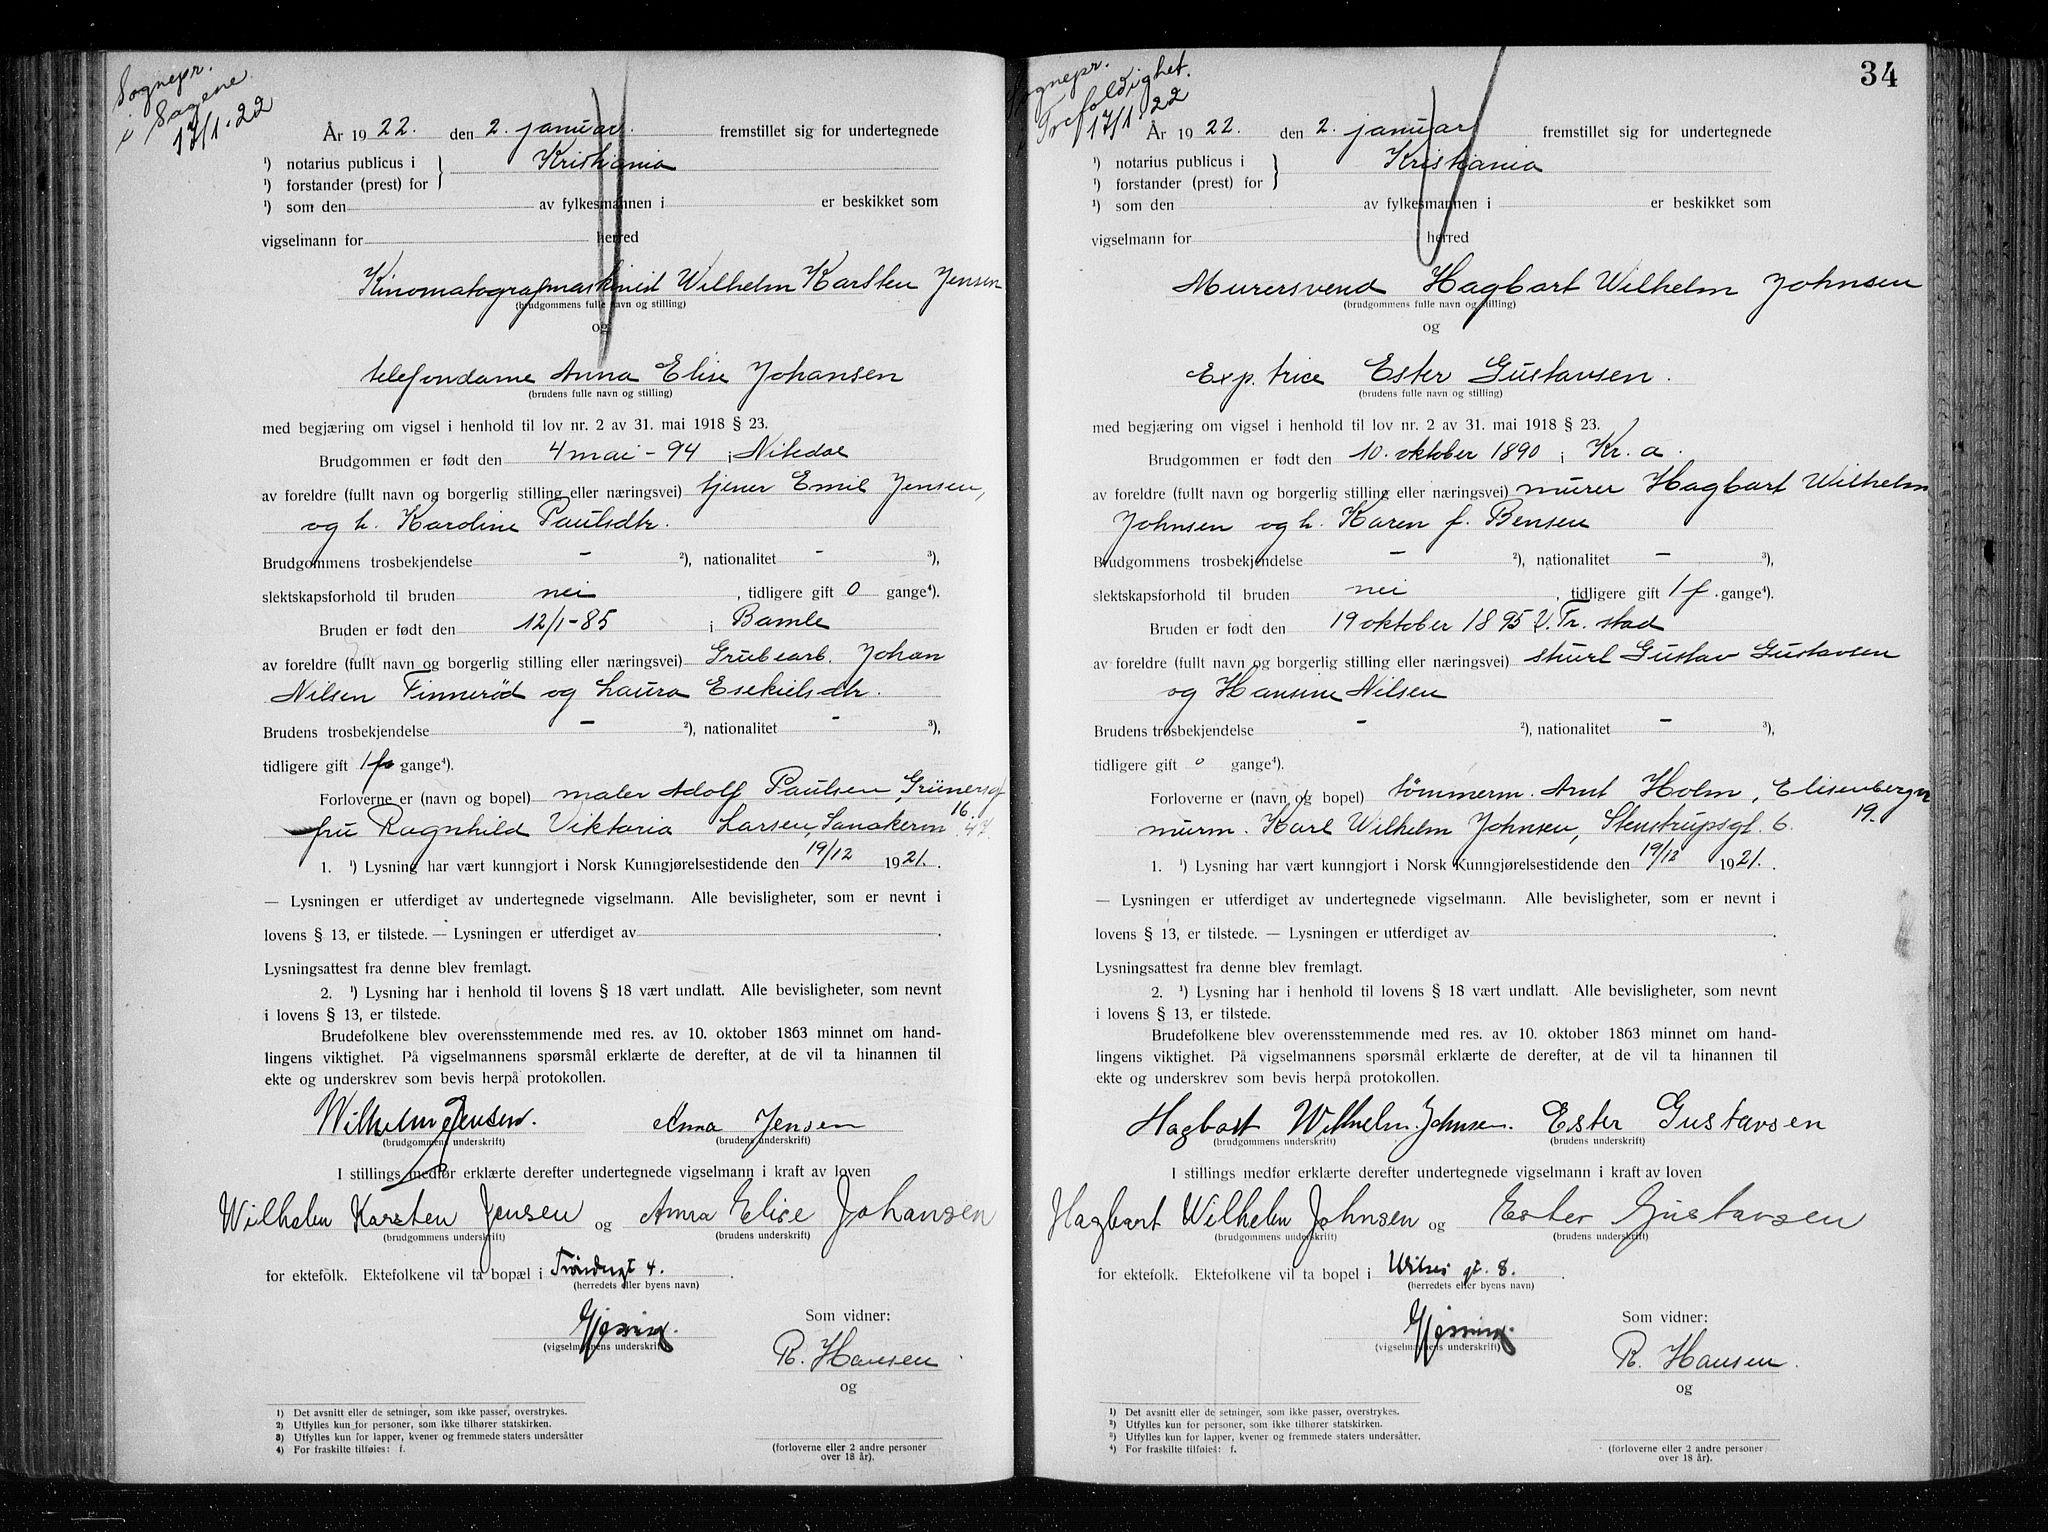 SAO, Oslo byfogd avd. I, L/Lb/Lbb/L0015: Notarialprotokoll, rekke II: Vigsler, 1921-1922, s. 33b-34a